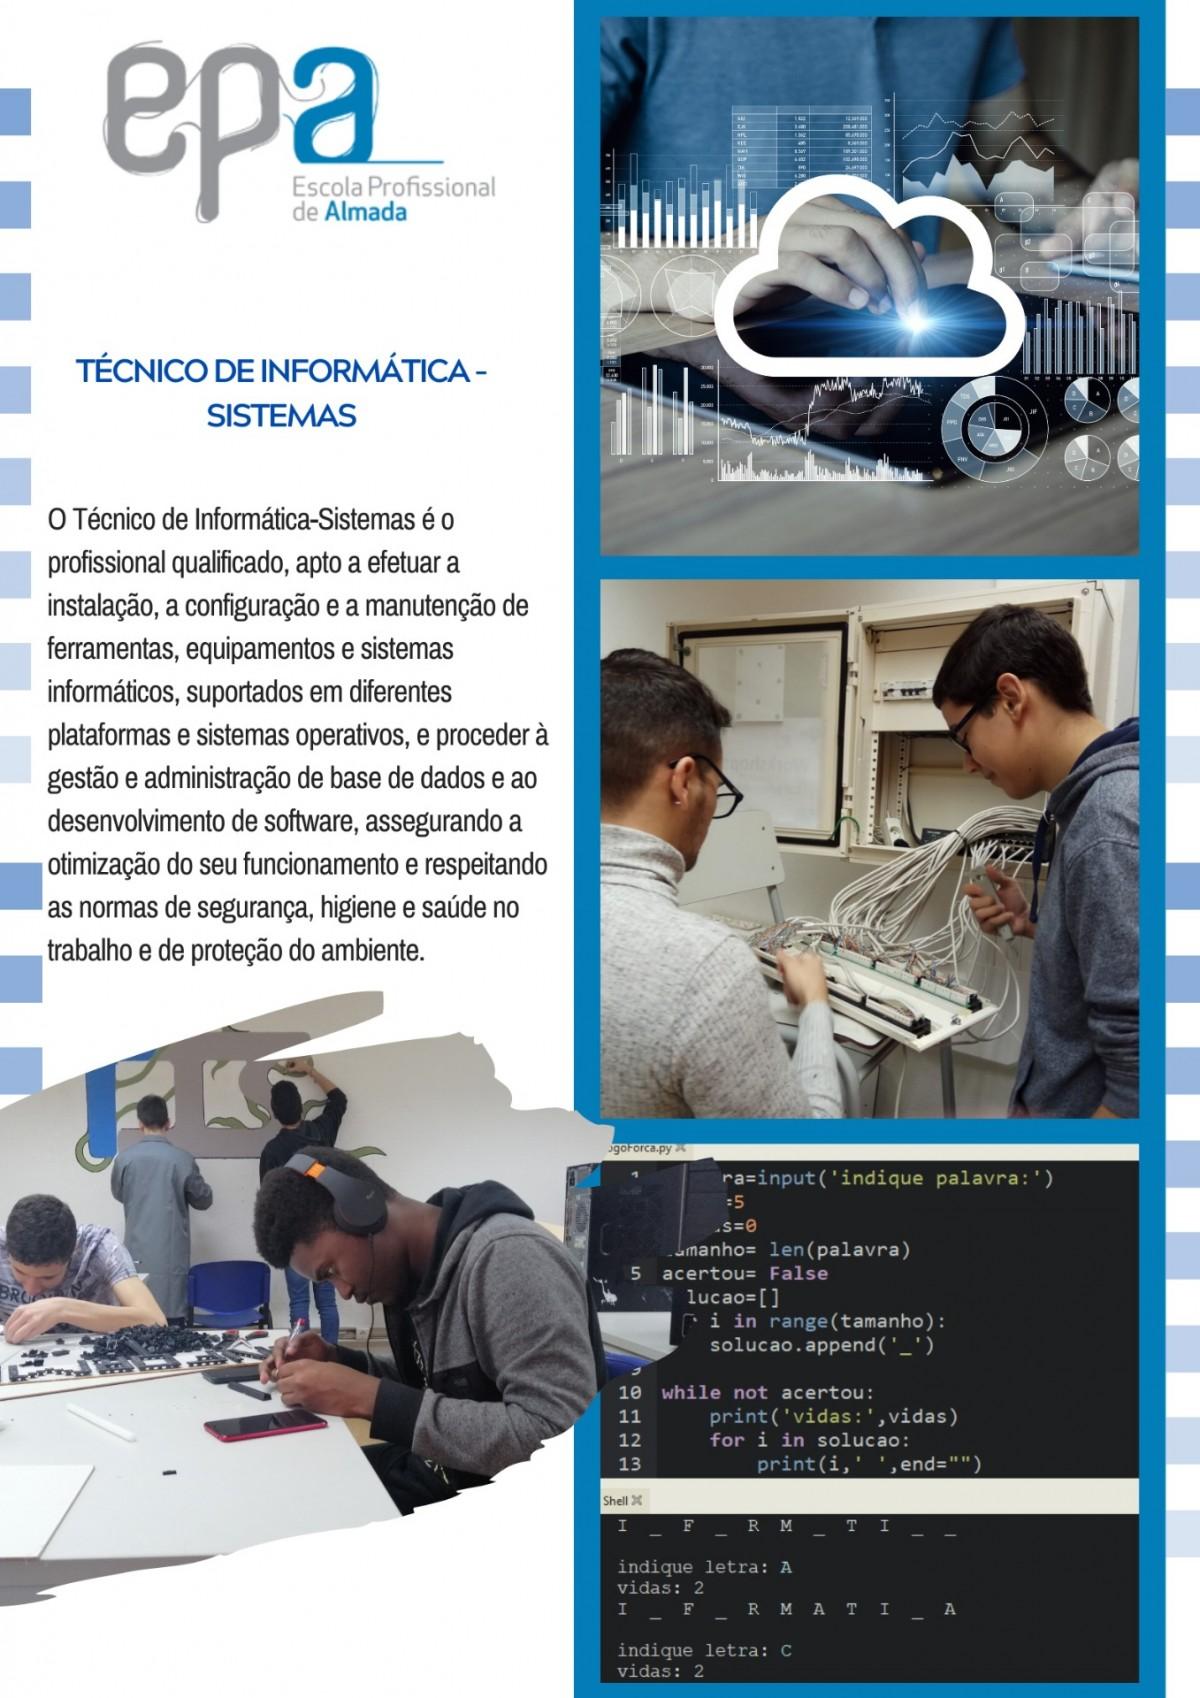 Técnico de Informática - Sistemas